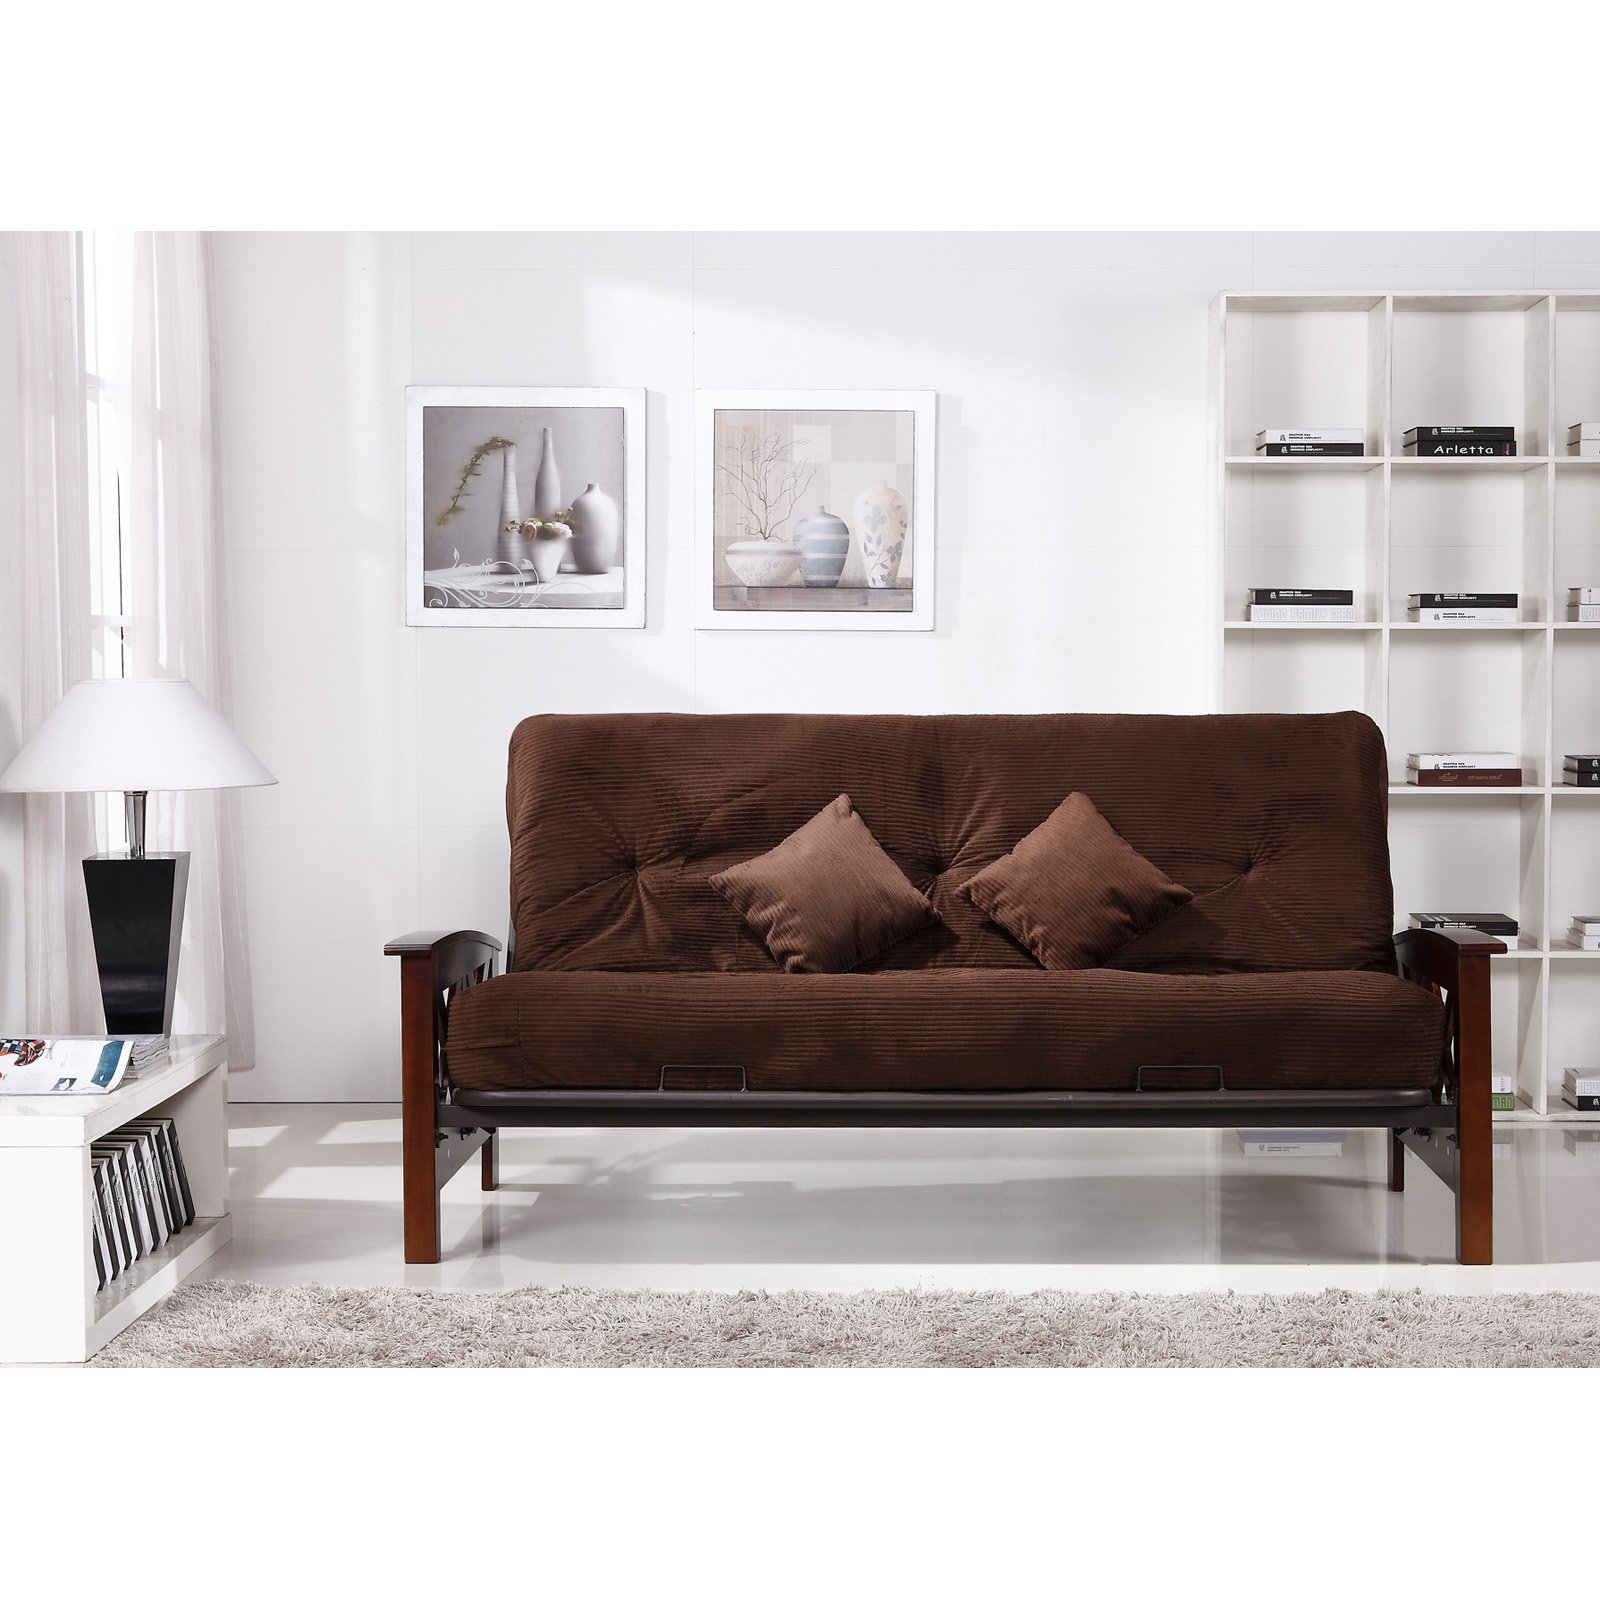 Primo International Trenton Upholstered Futon